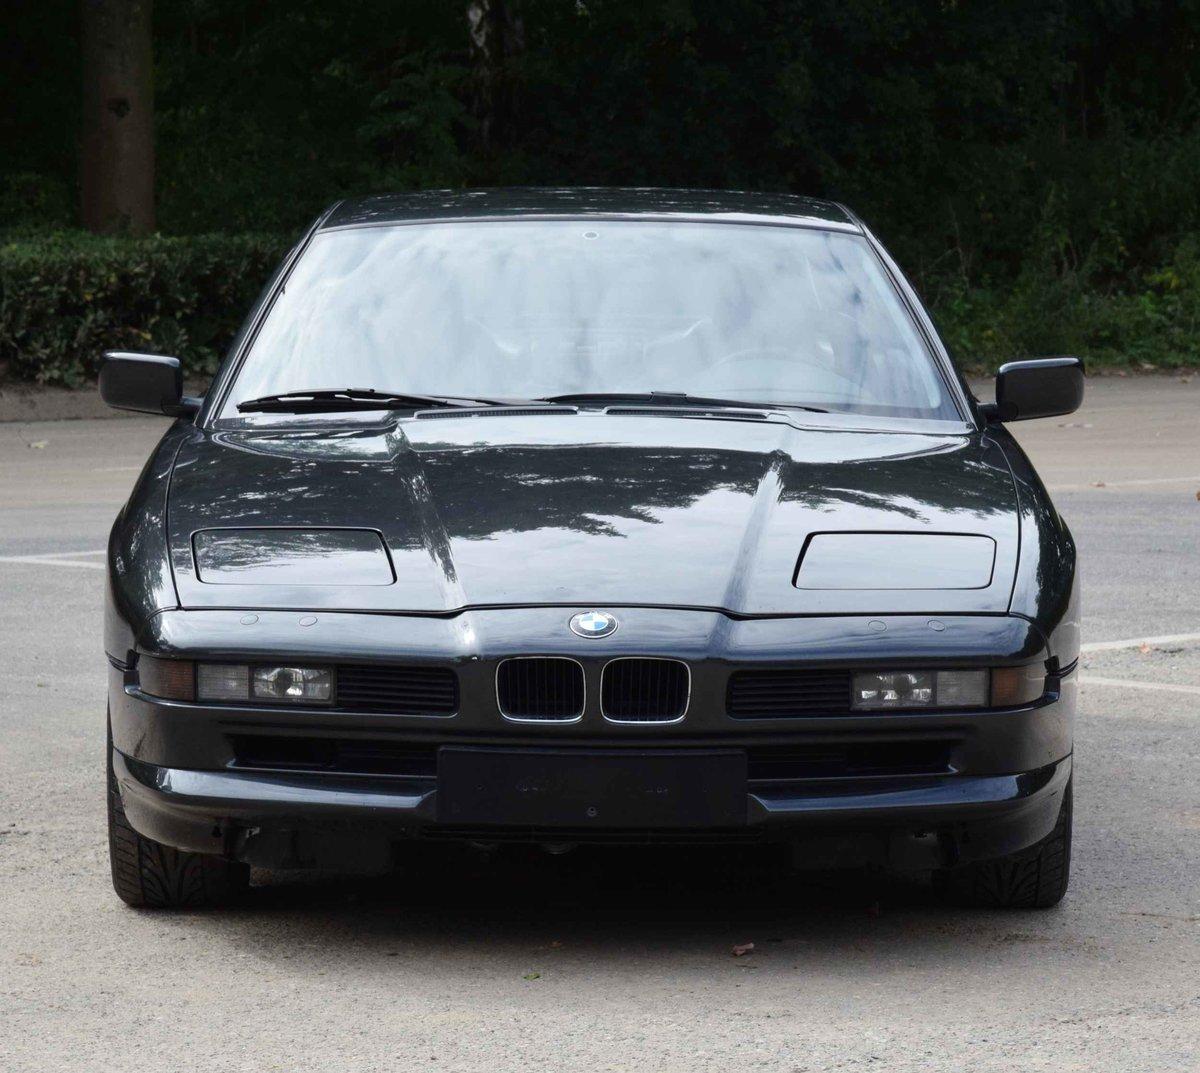 1993 BMW 850i Coupé diamond black 5000cc sports car For Sale (picture 4 of 6)